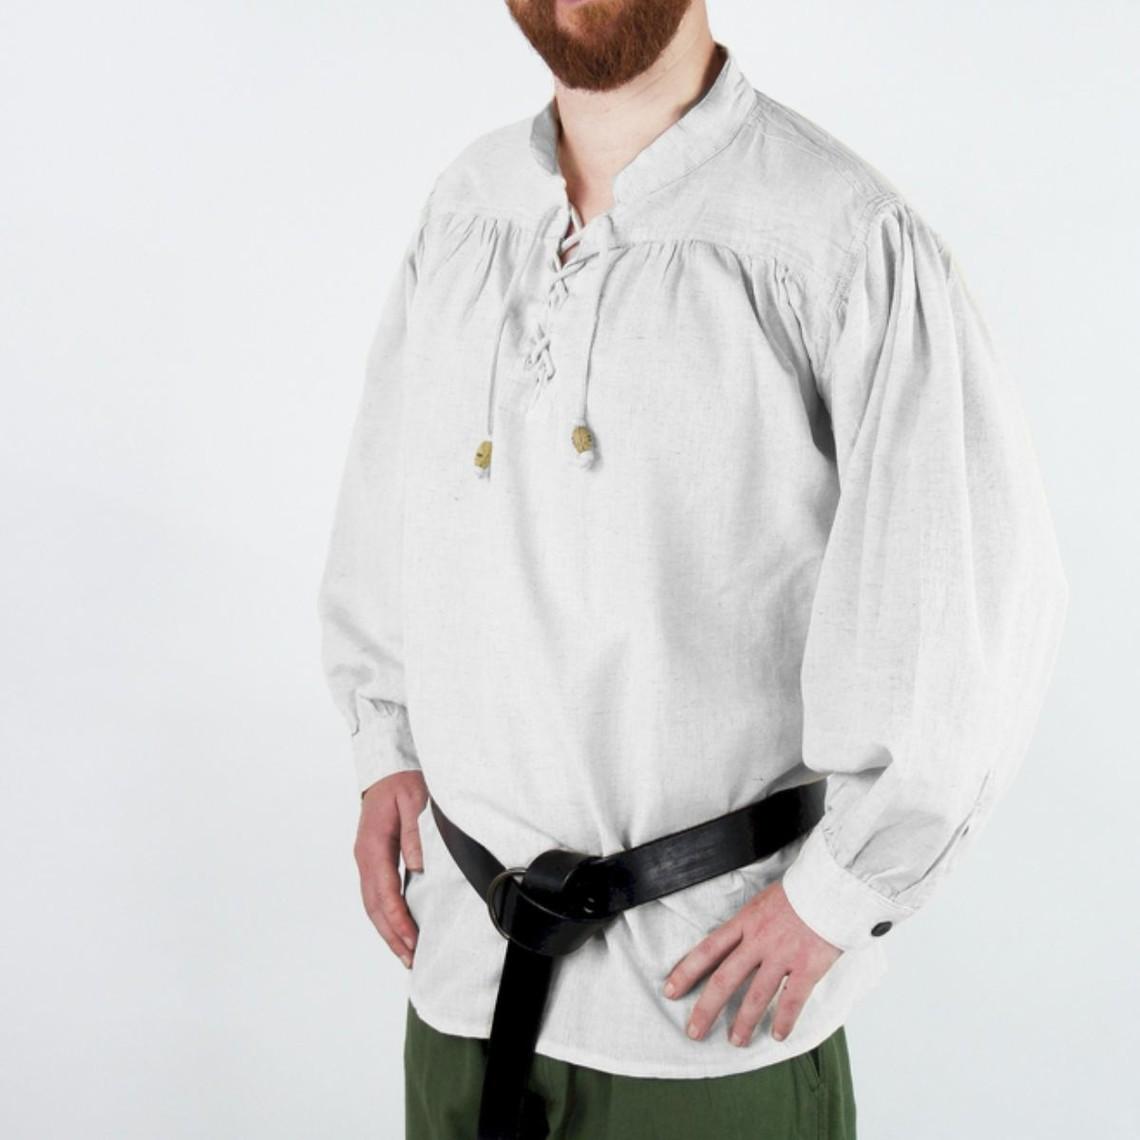 Leonardo Carbone Camisa medieval, blanca.